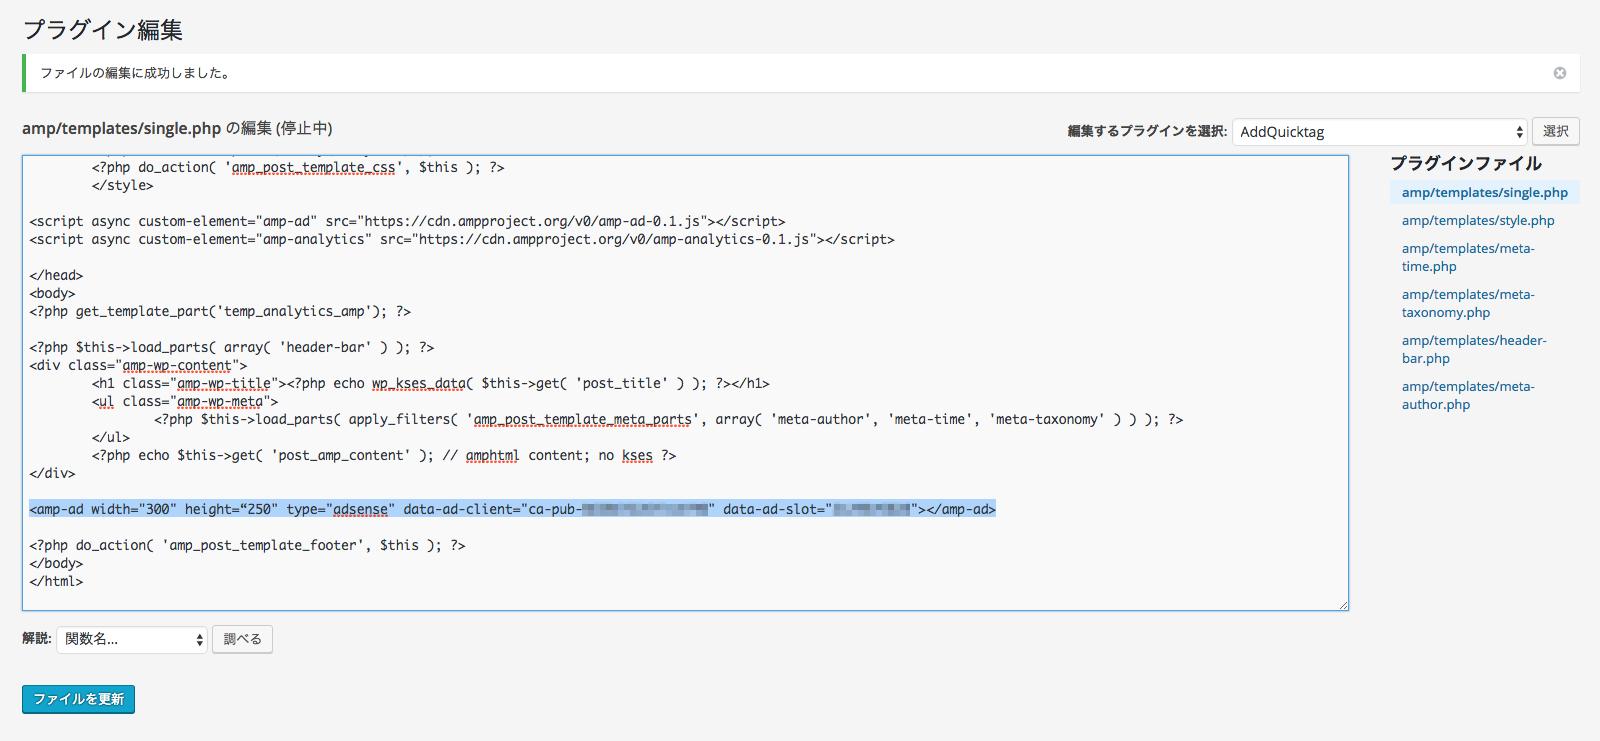 WordPressのAMP公式プラグインでAdSenseの記述方法